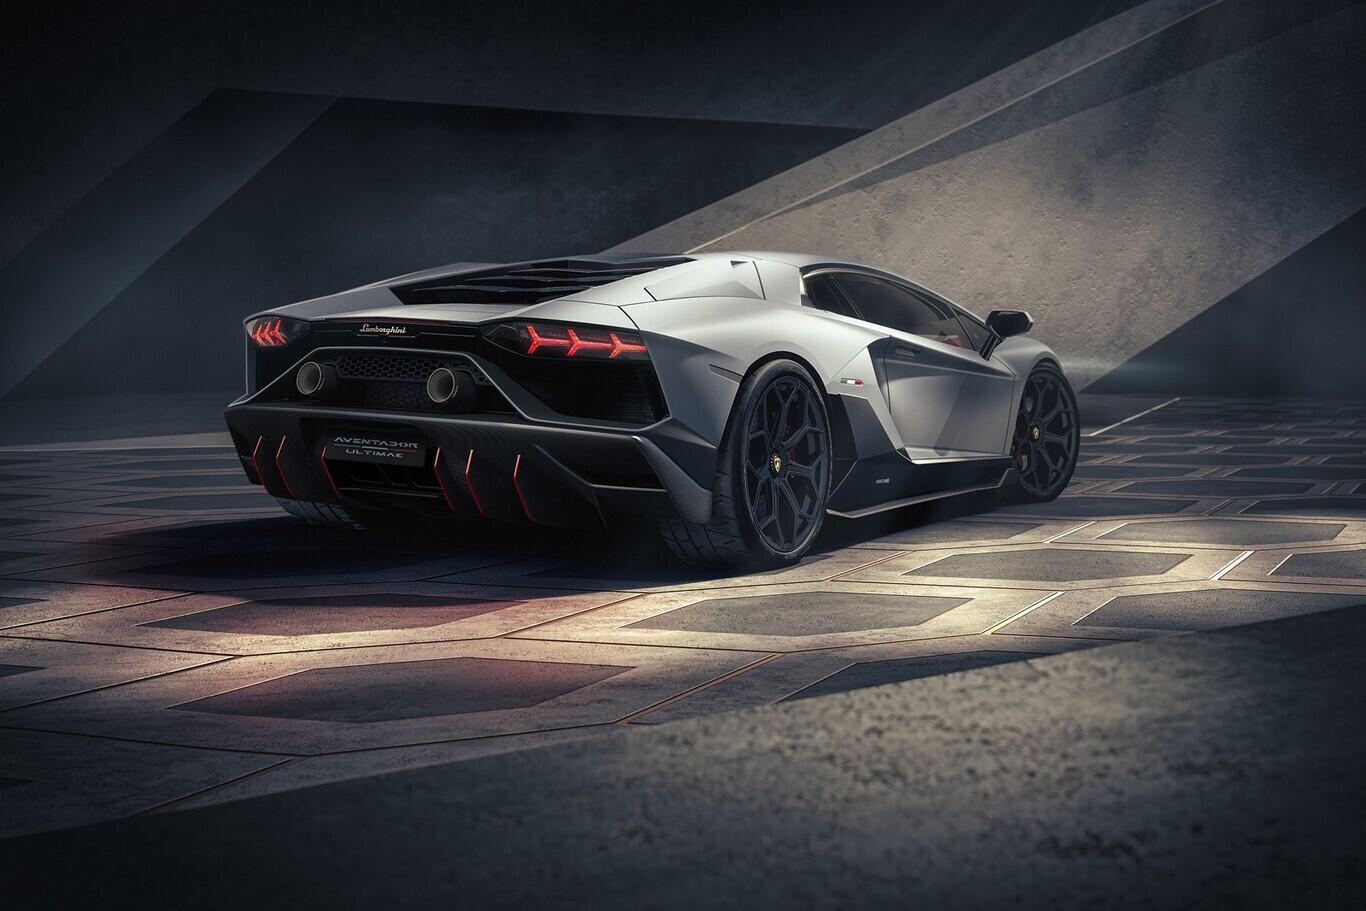 Foto de Lamborghini Aventador LP780-4 Ultimae (5/18)